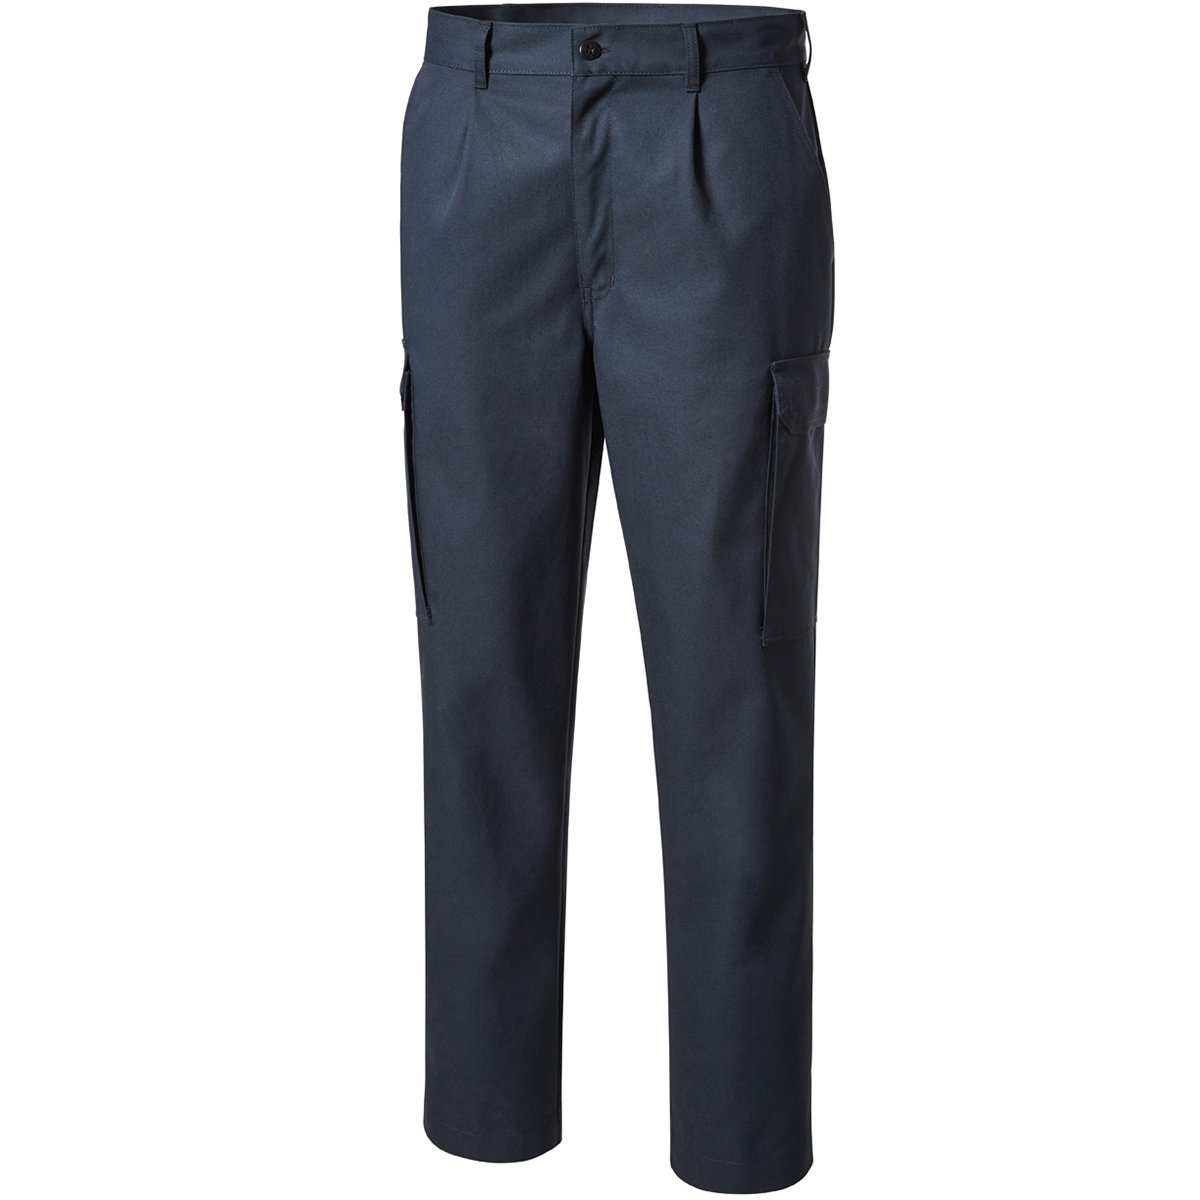 Pionier 8304-94 8304-94 8304-94 Cargo-Hose  Denim , Marineblau, Größe 94 B004N5OWE8 Arbeitsshorts Elegante Form 4598f6